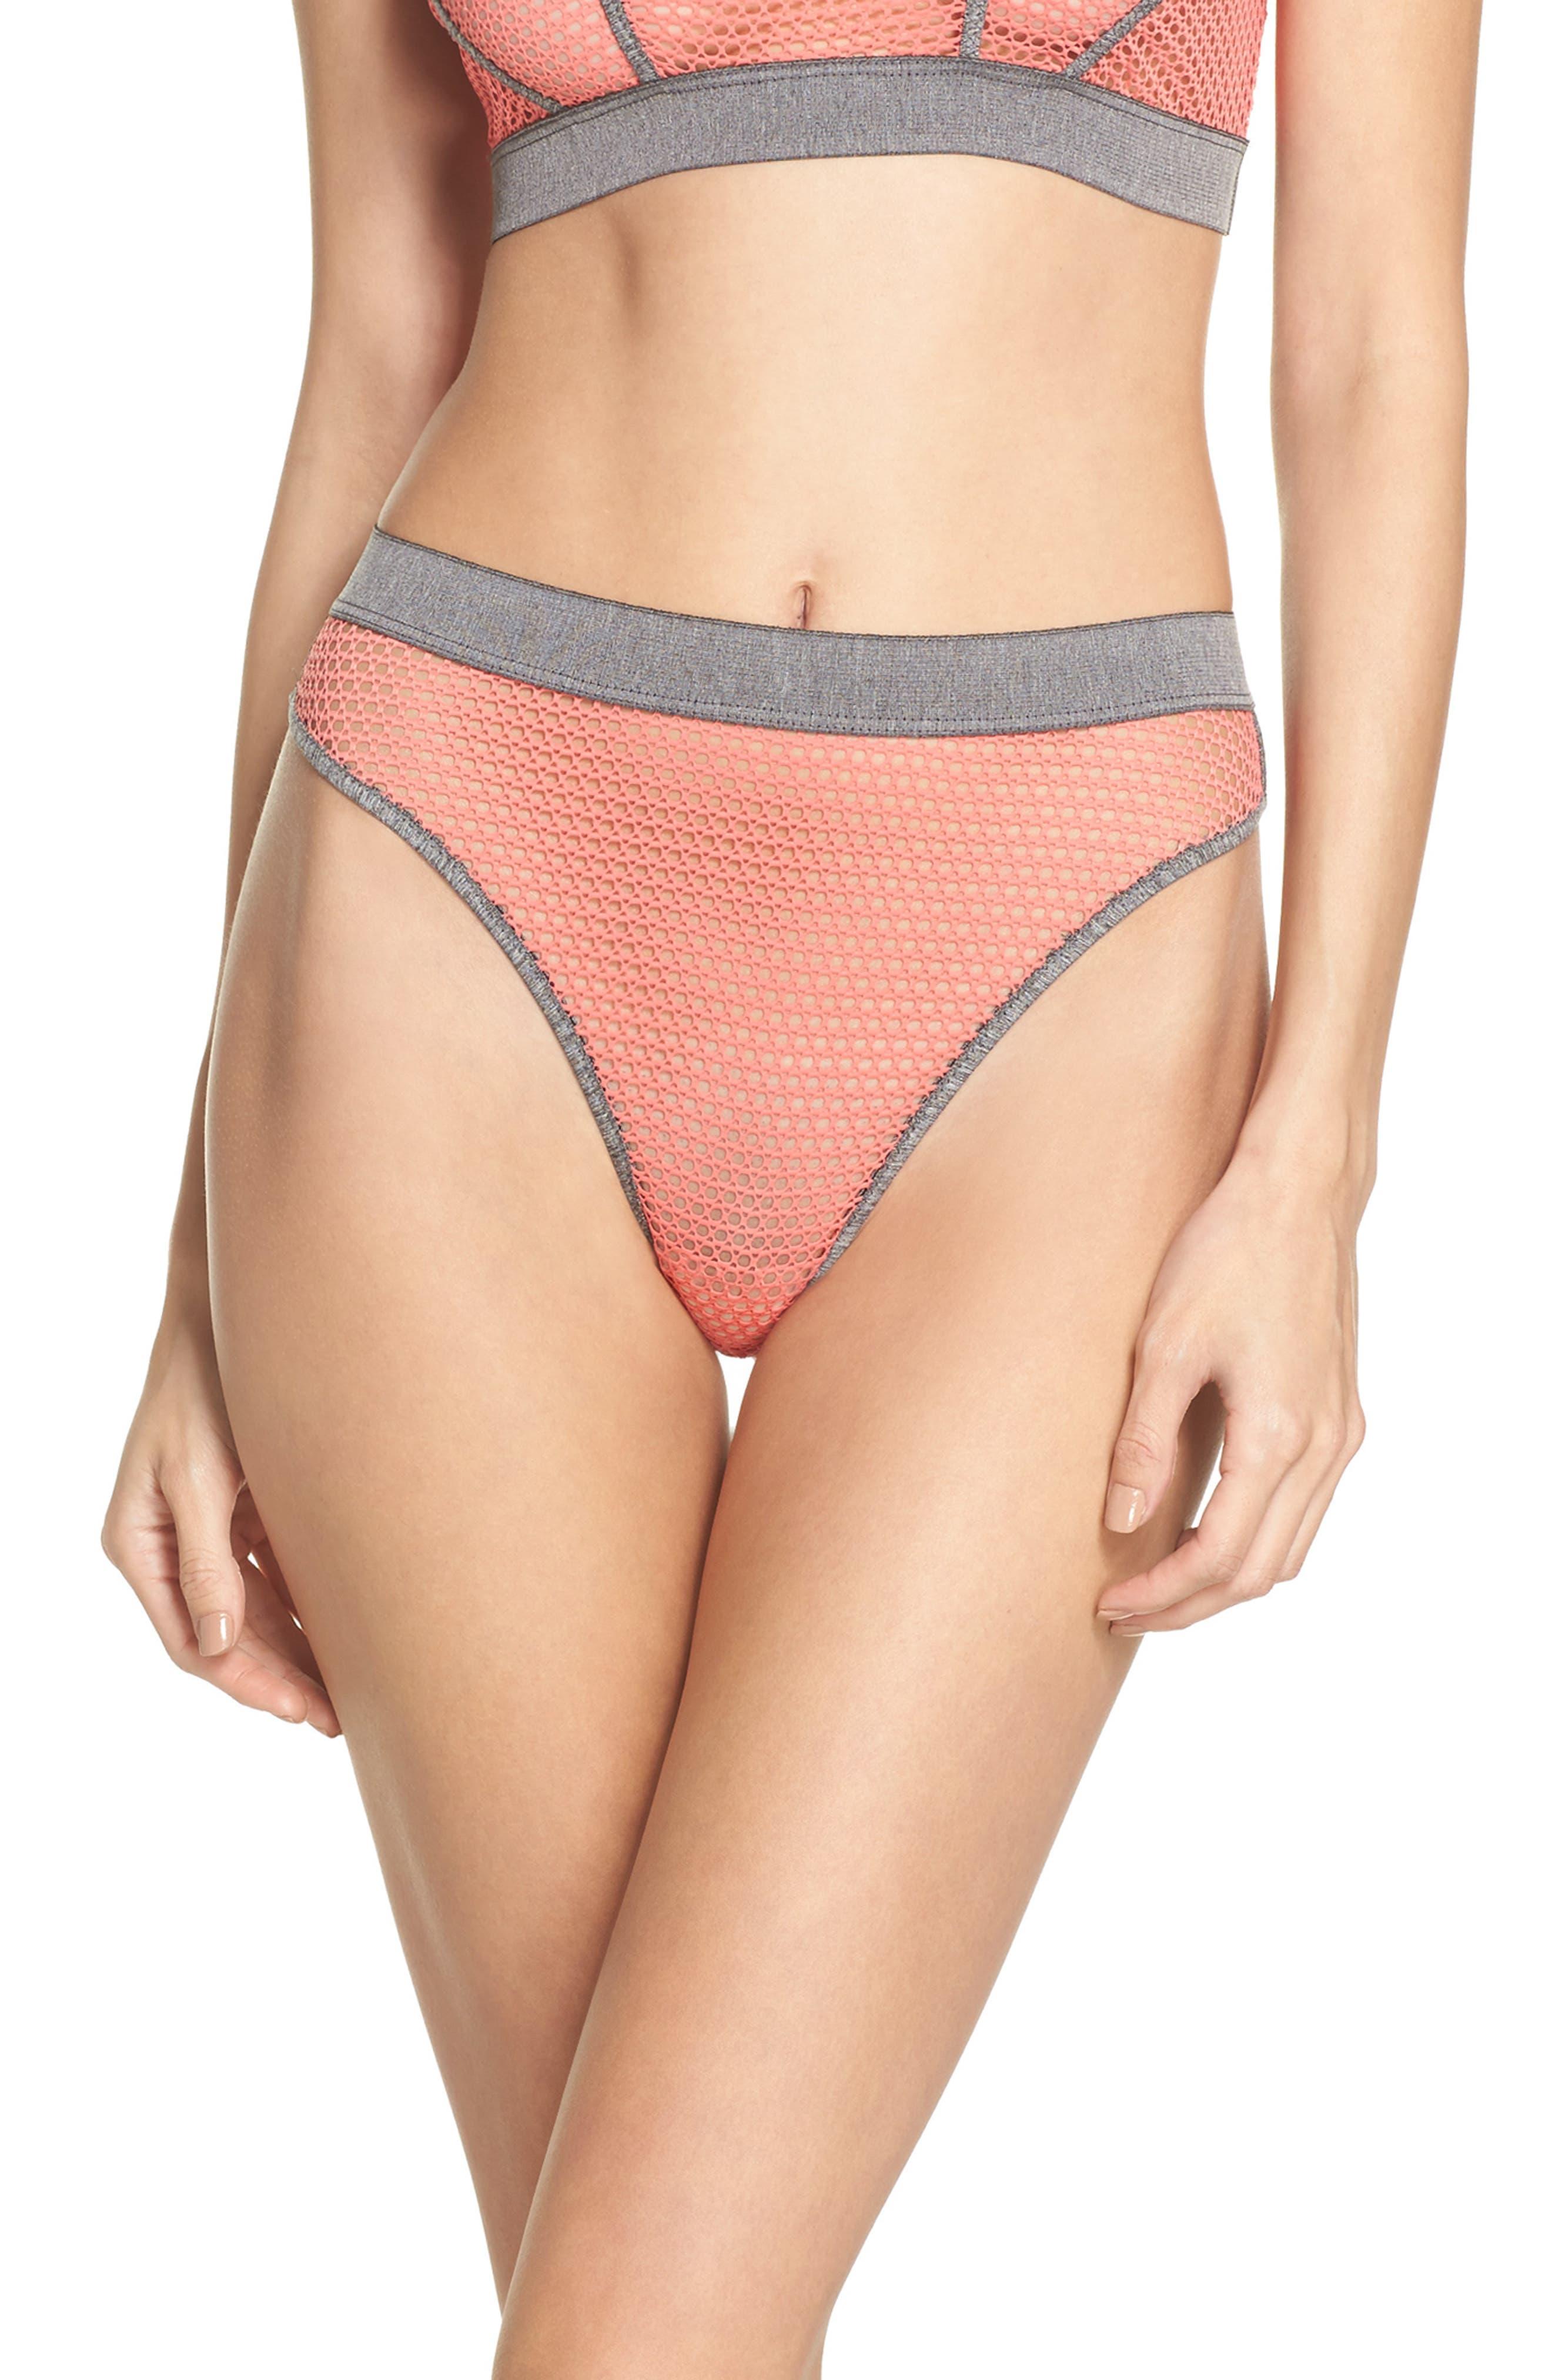 Myah High Leg Bikini,                         Main,                         color, Moroccan Rose/ Heath Gray